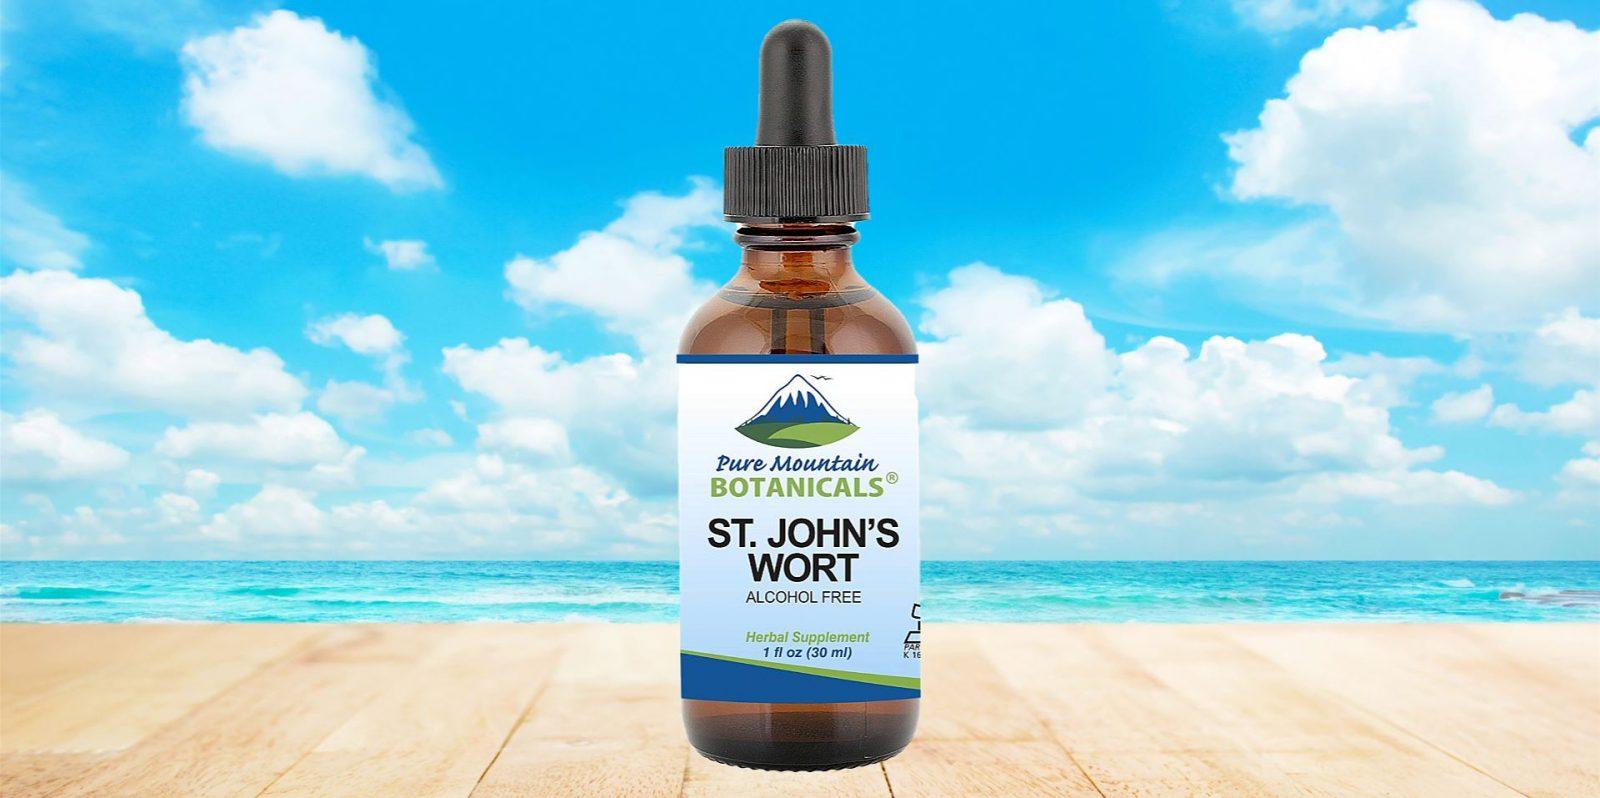 Pure Mountain Botanicals St John's Wort Tincture